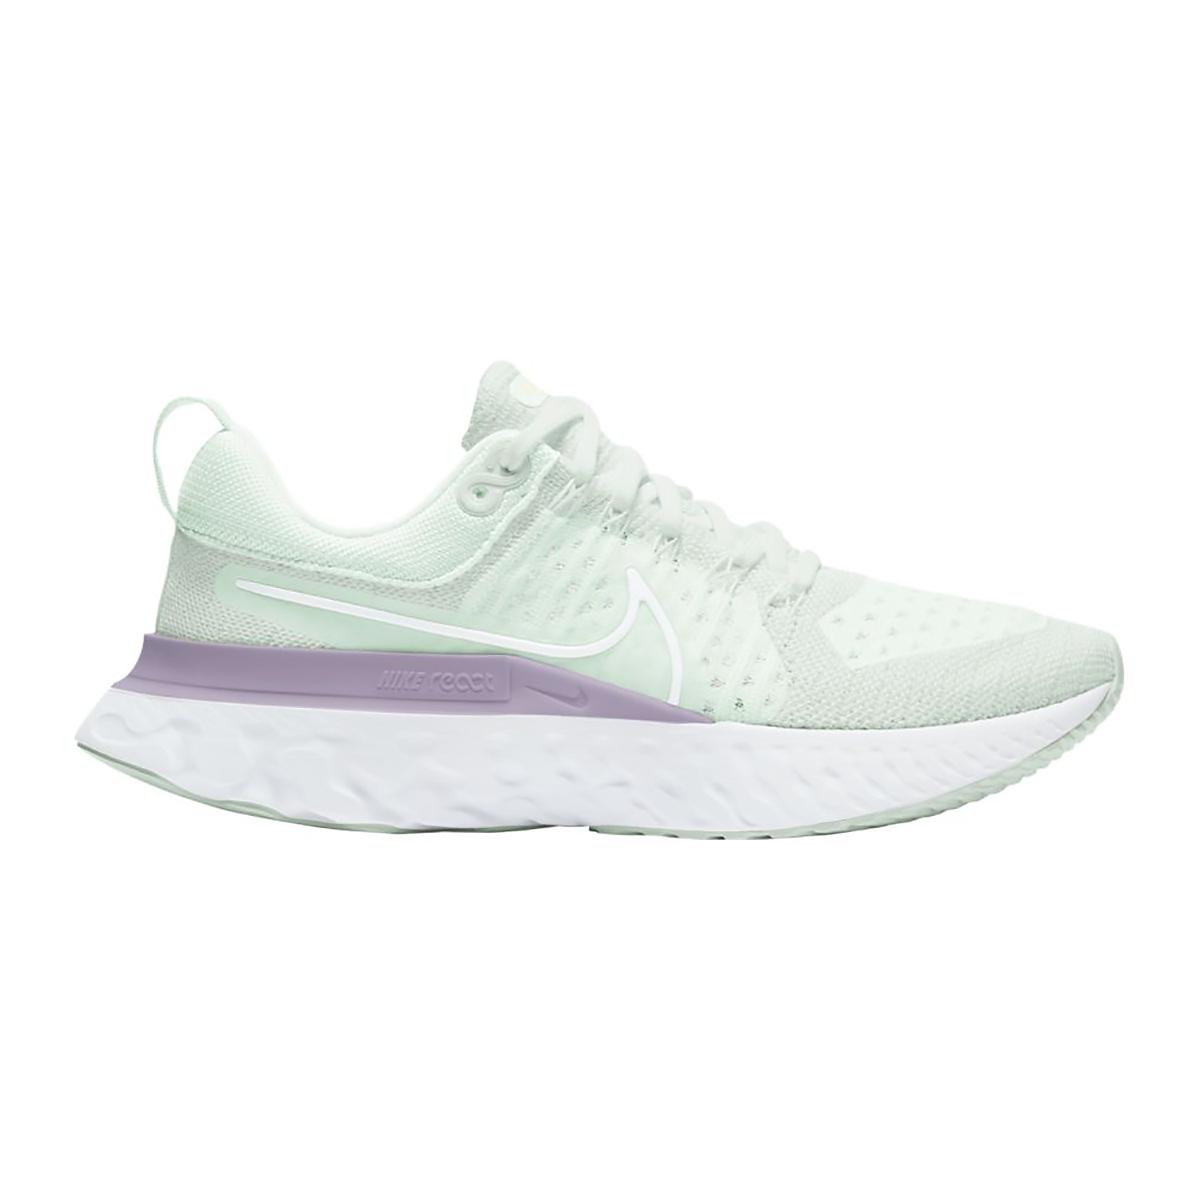 Women's Nike React Infinity Run Flyknit 2 Running Shoe - Color: Light Silver/White/Lilac - Size: 5.5 - Width: Regular, Light Silver/White/Lilac, large, image 1